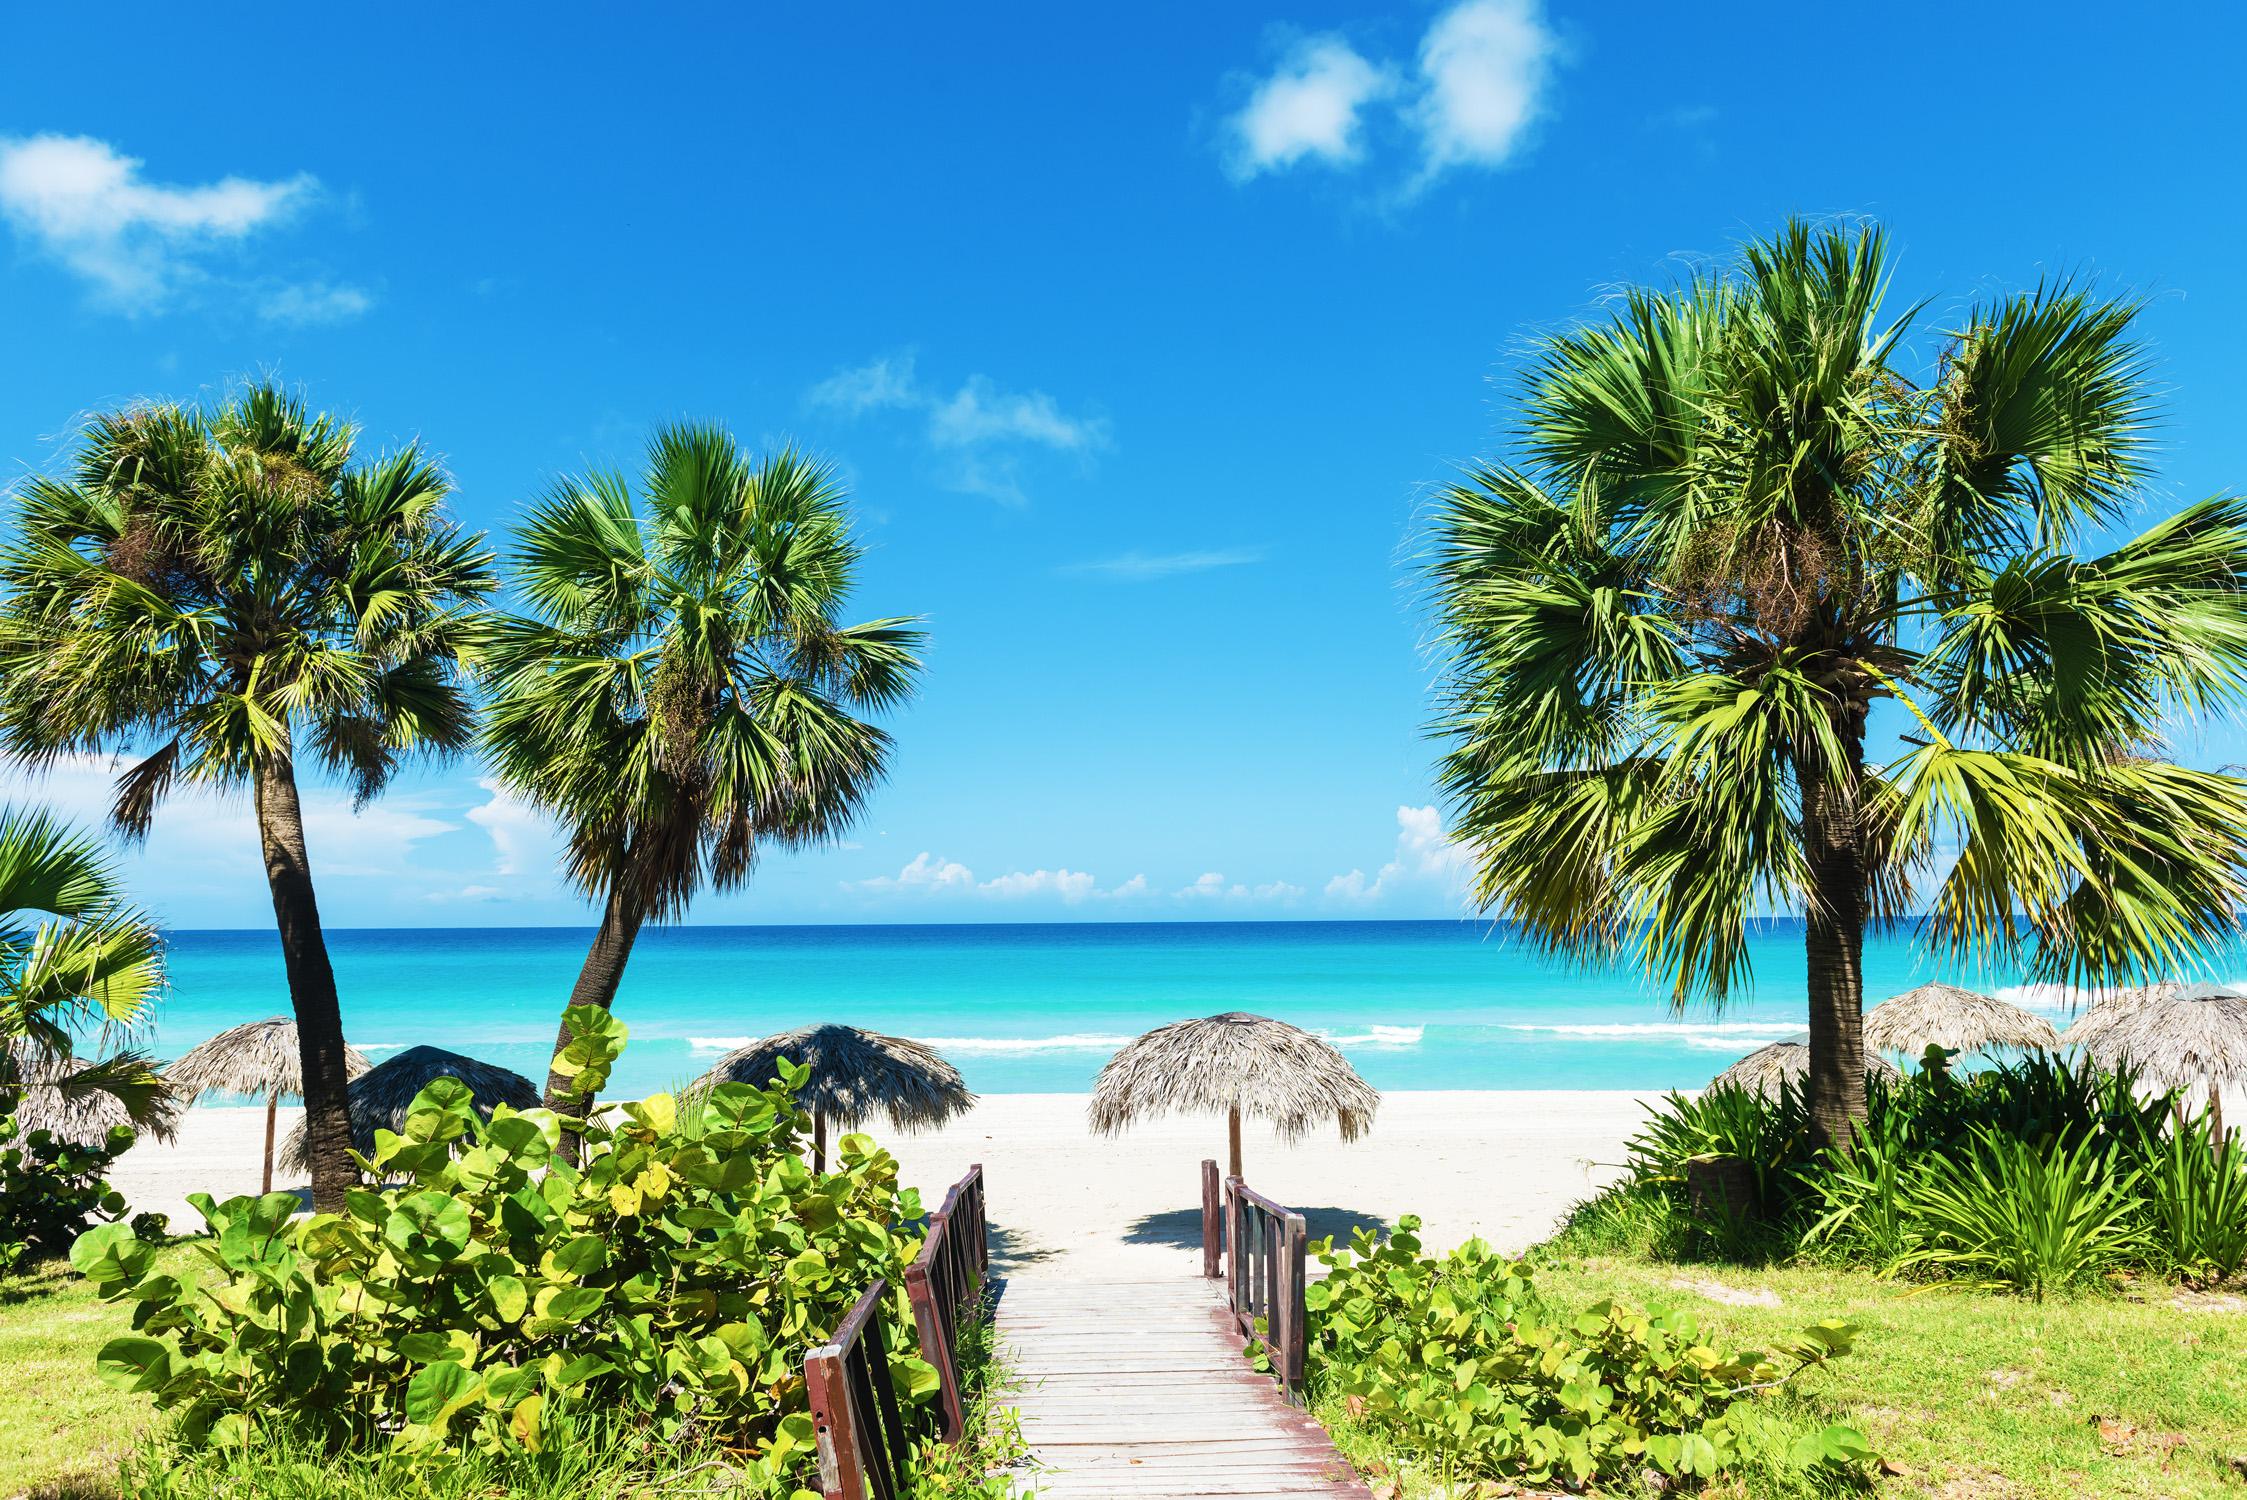 karibik traum 14 tage kuba all inclusive im 4 hotel mit